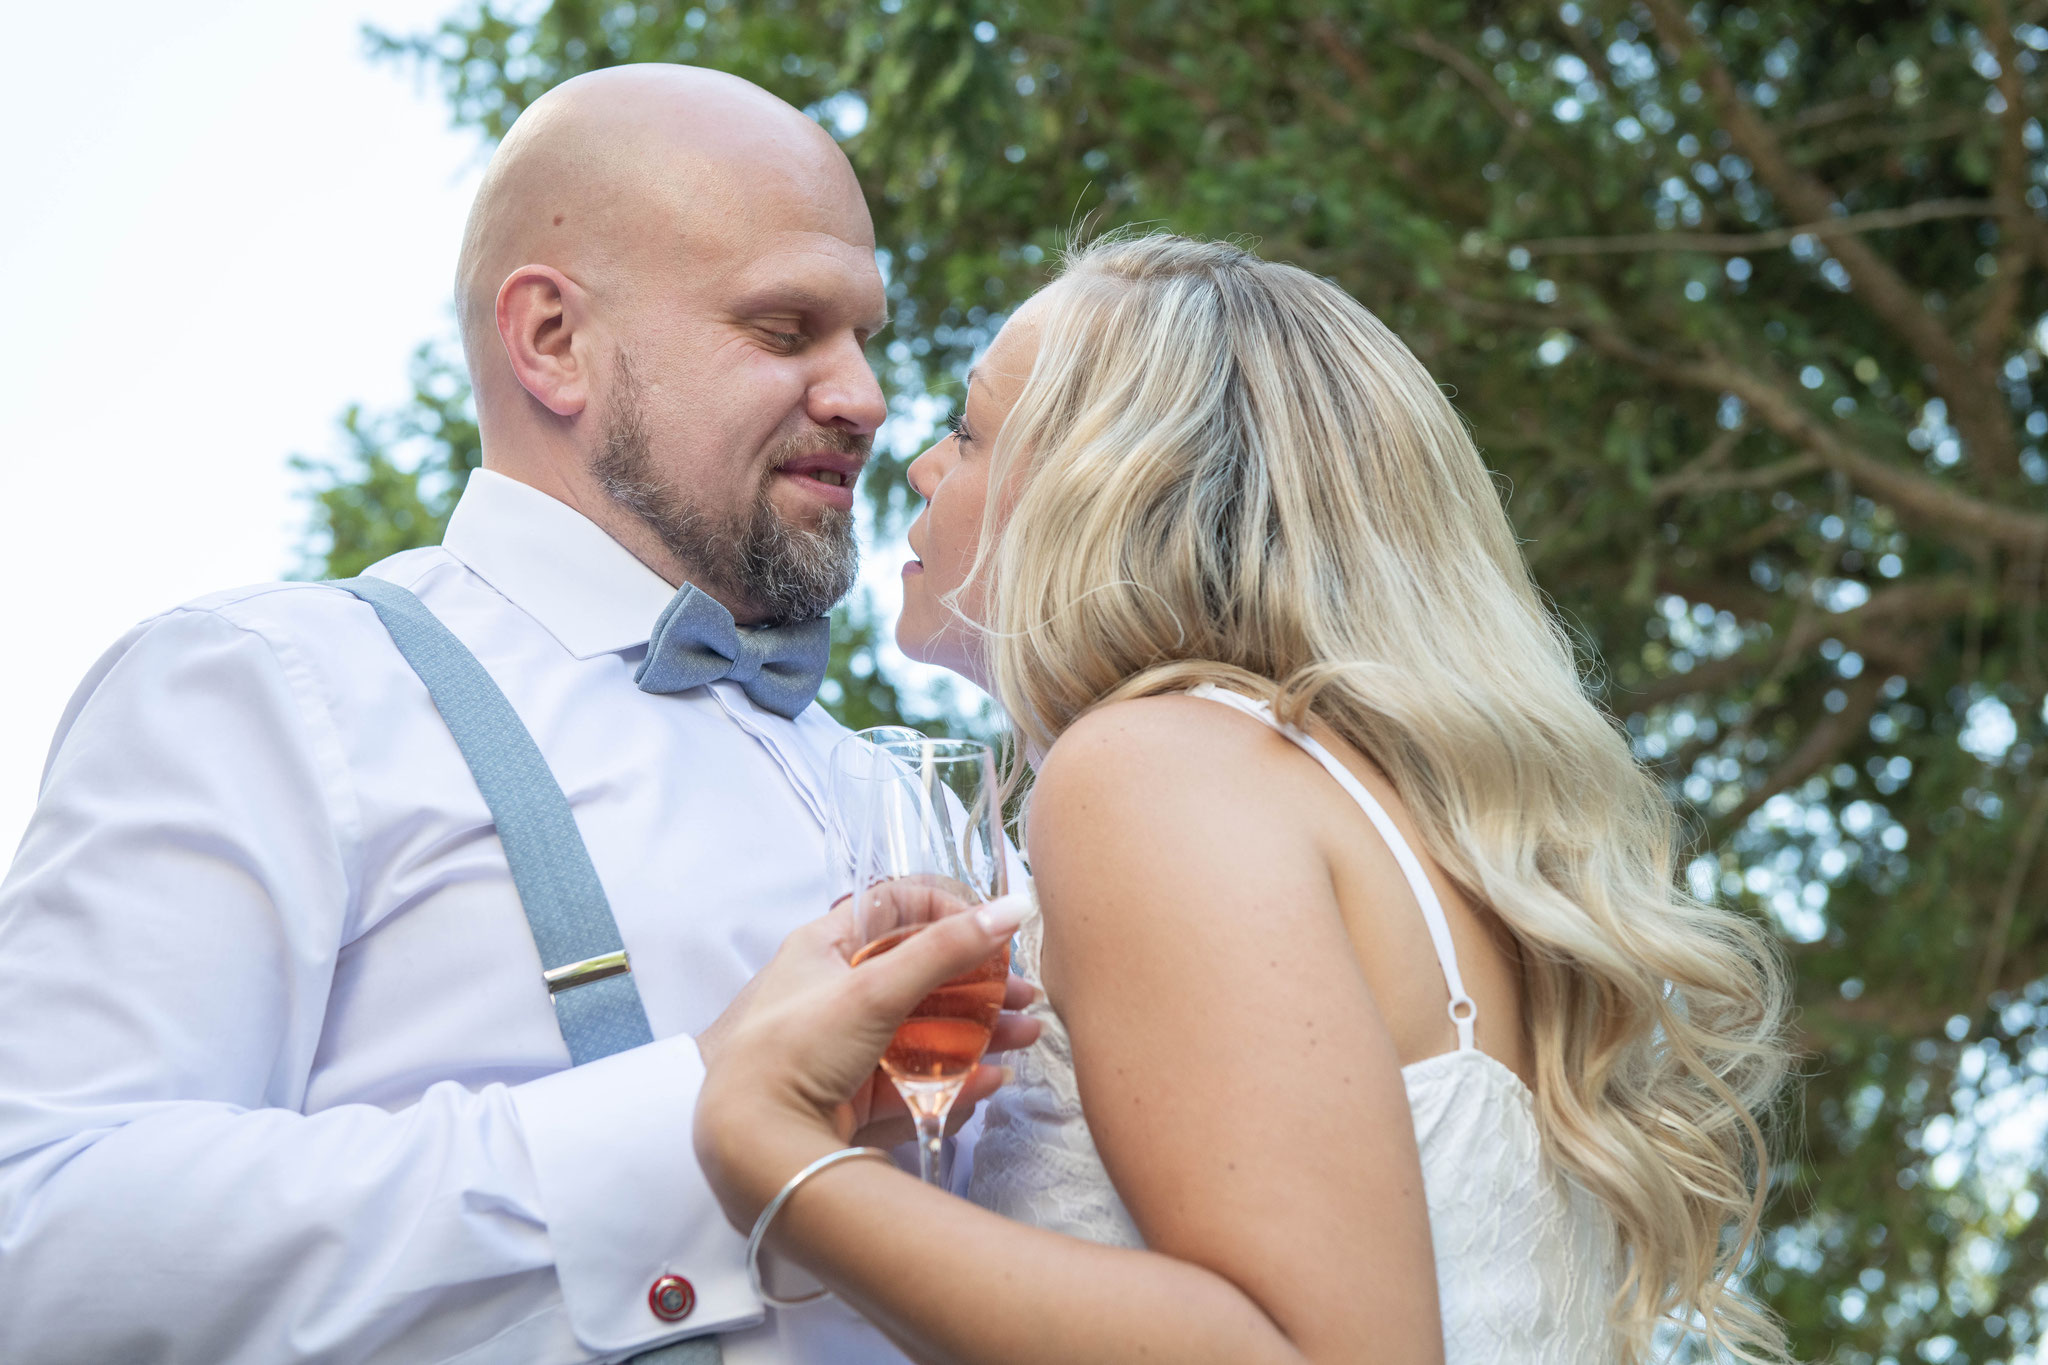 Brautpaar small talk